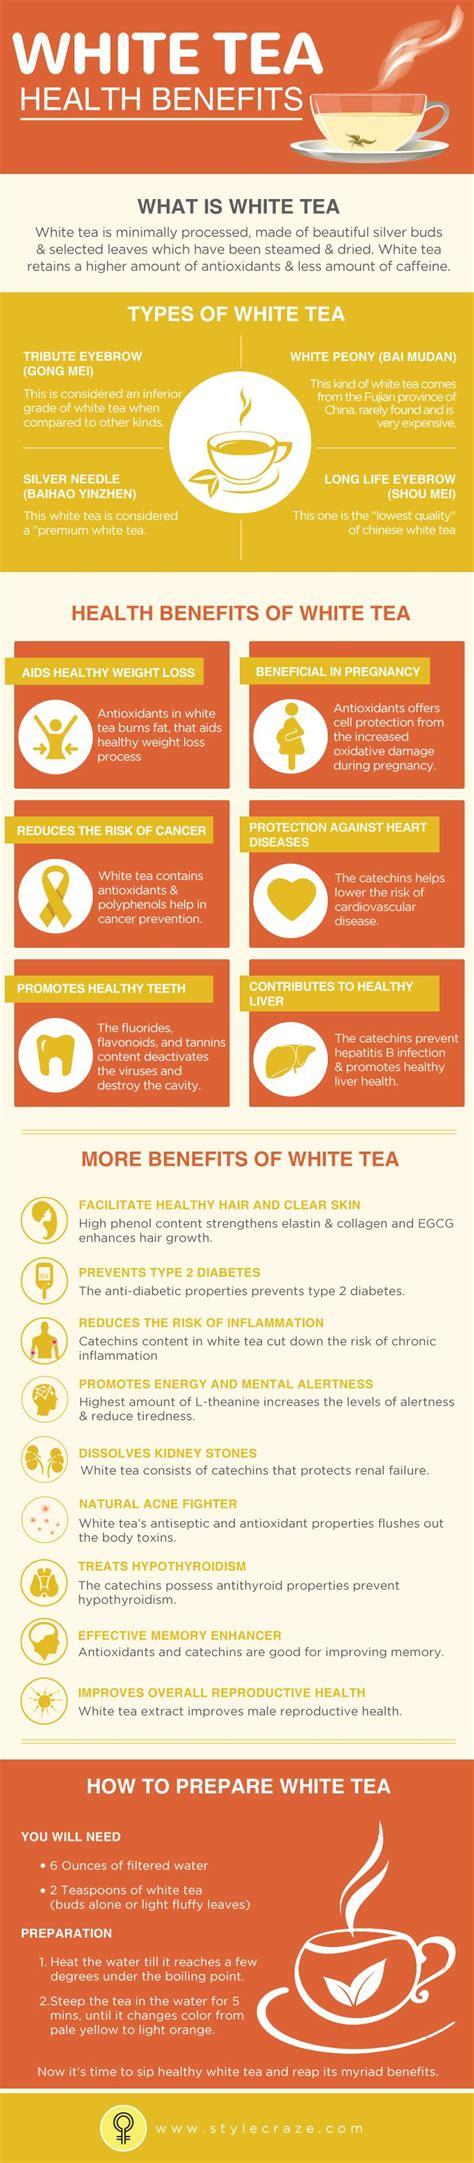 Health King Detoxer Herb Tea Benefits by 25 Best Ideas About White Tea Benefits On